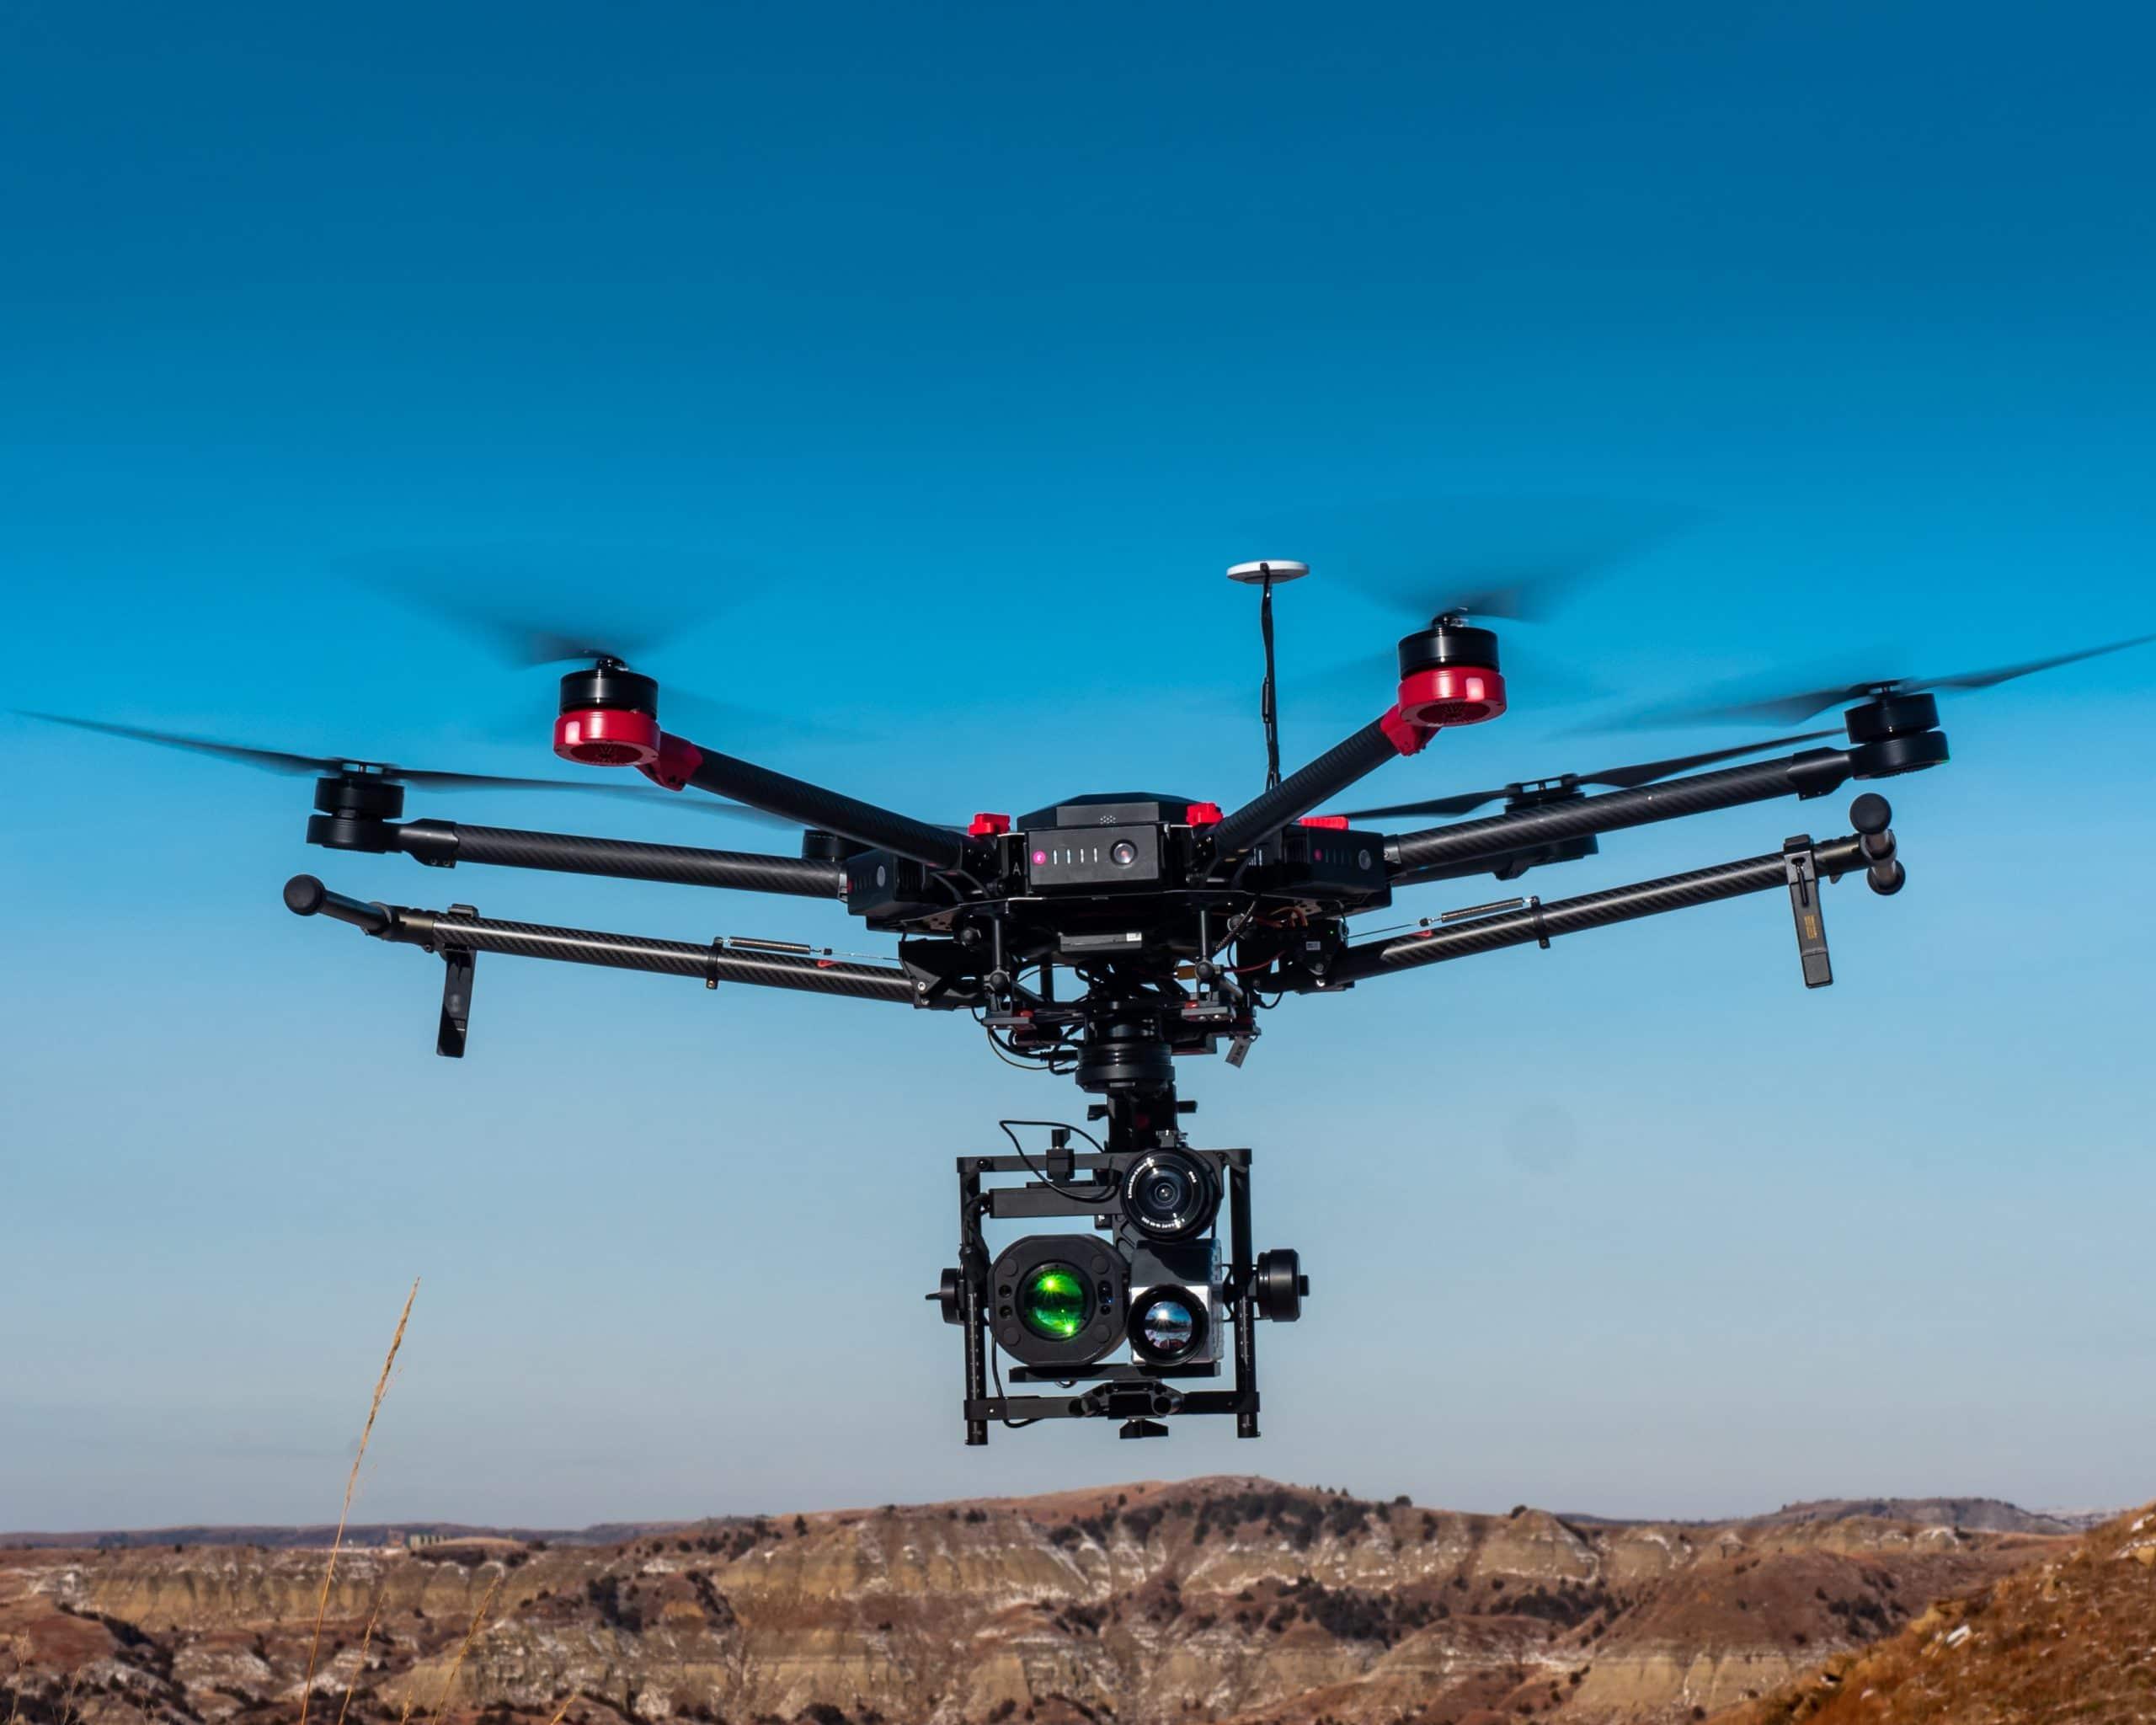 Drone in flight - SkySkopes